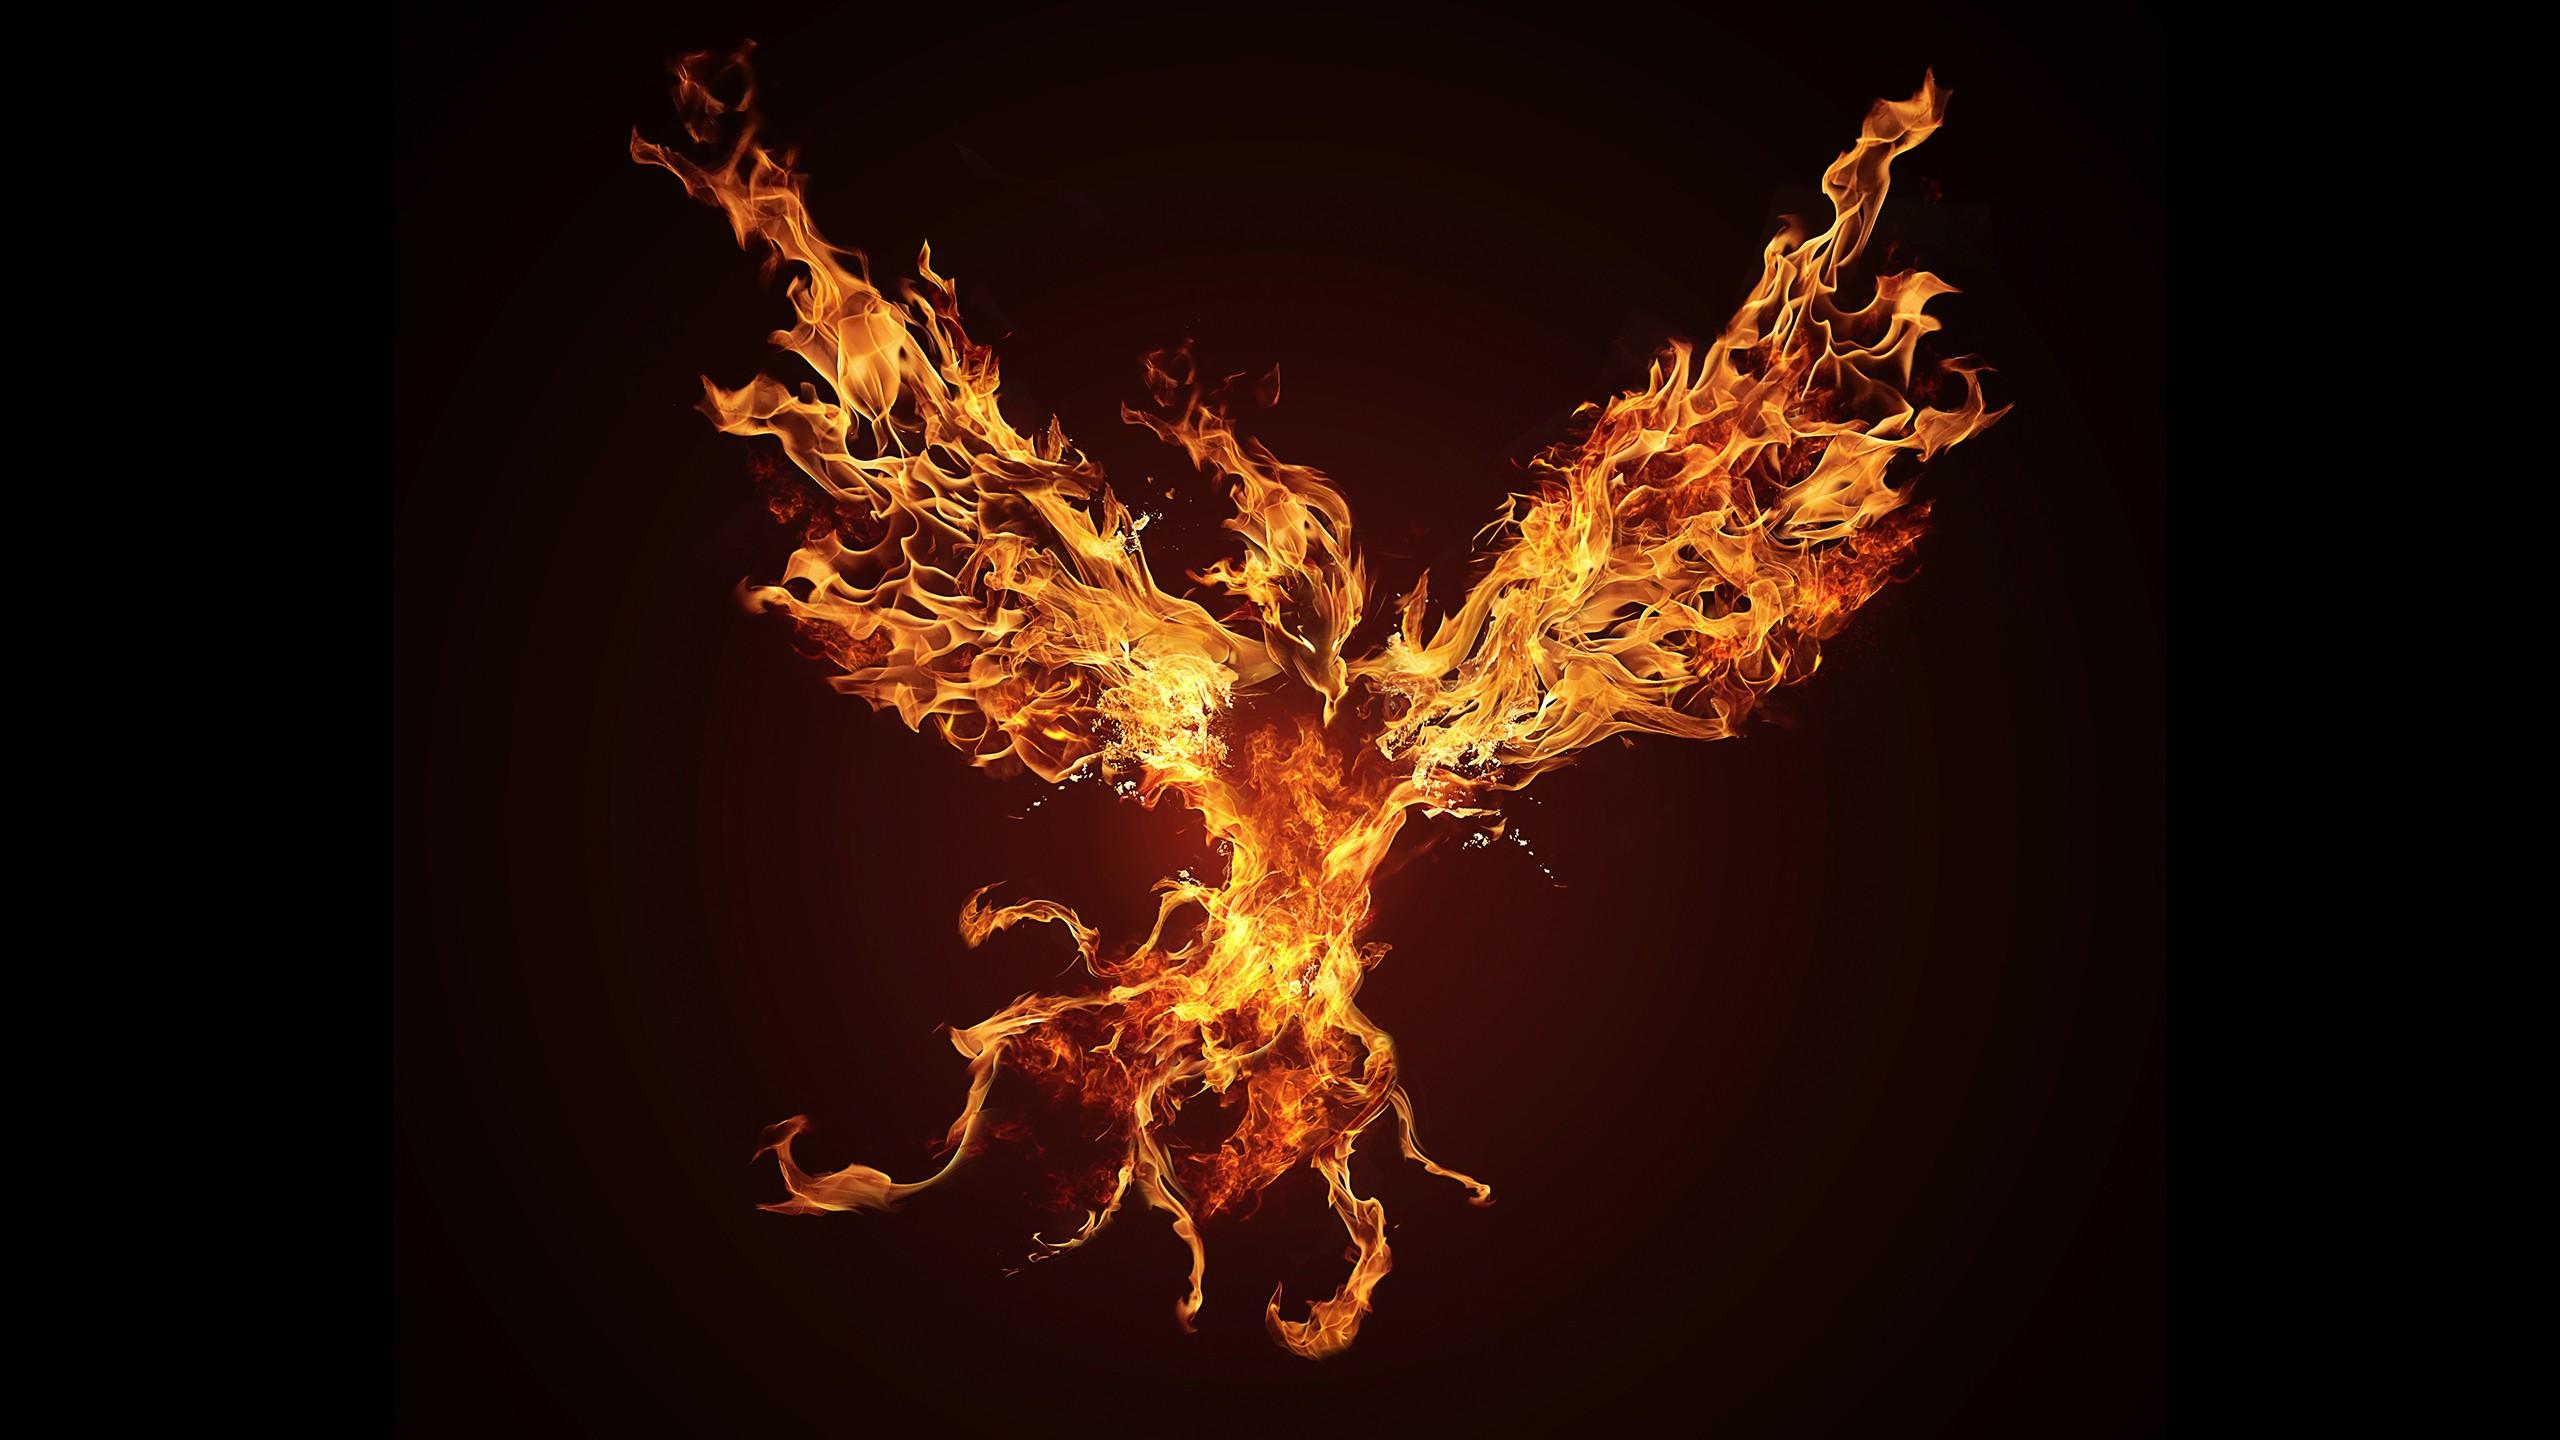 Fall Out Boy Wallpaper Ipad Phoenix Wallpaper 183 ① Download Free Beautiful High